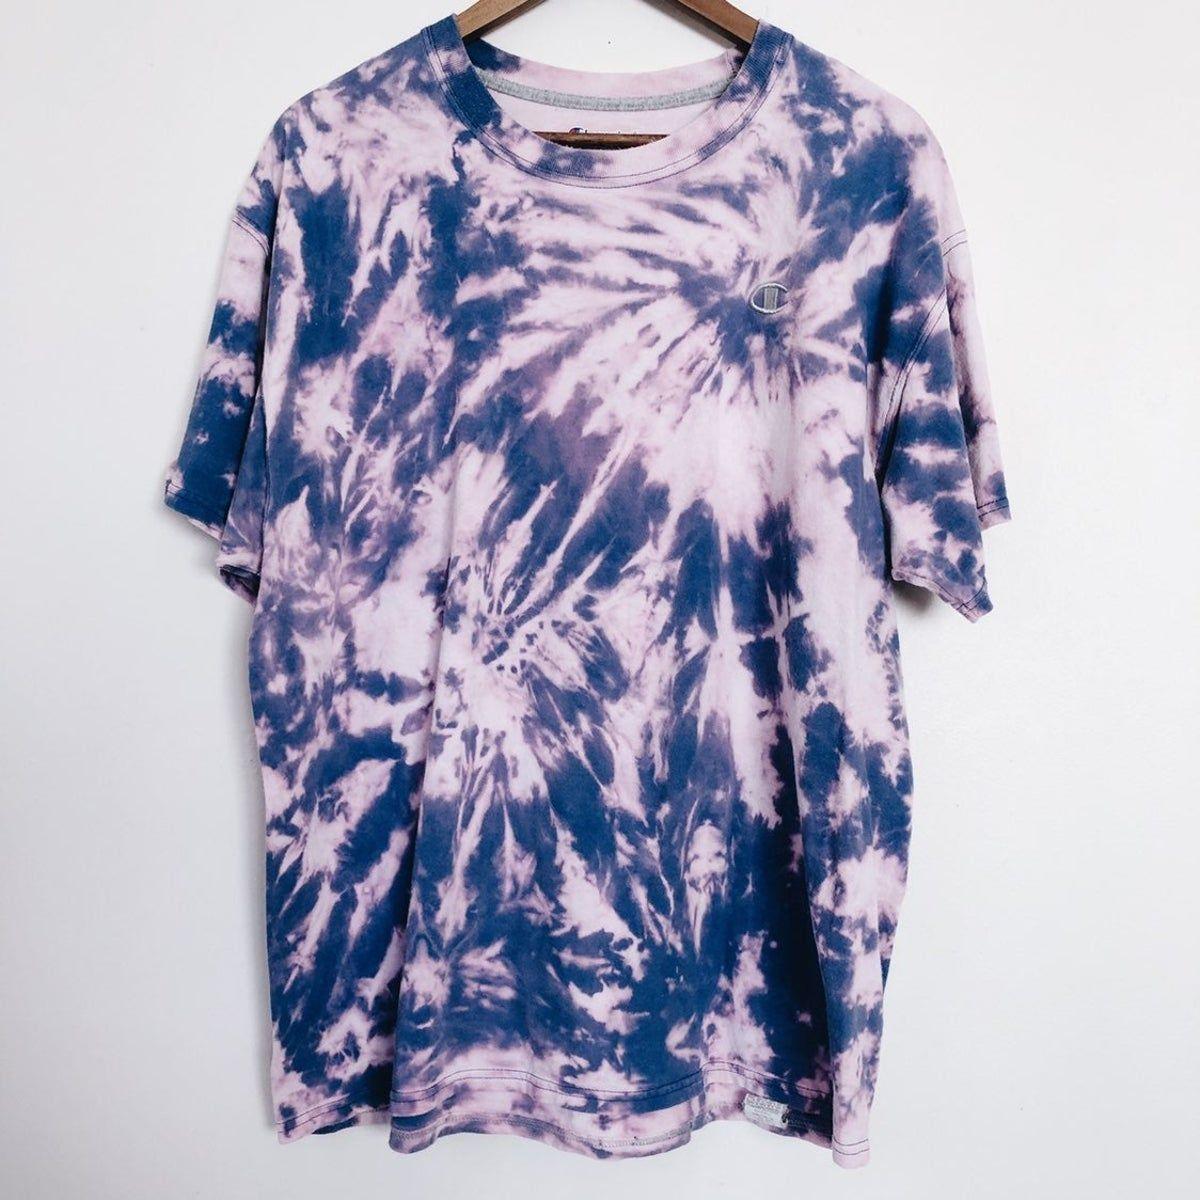 Champion Tie Dye Bleached T Shirt in 2020 | Bleach t shirts